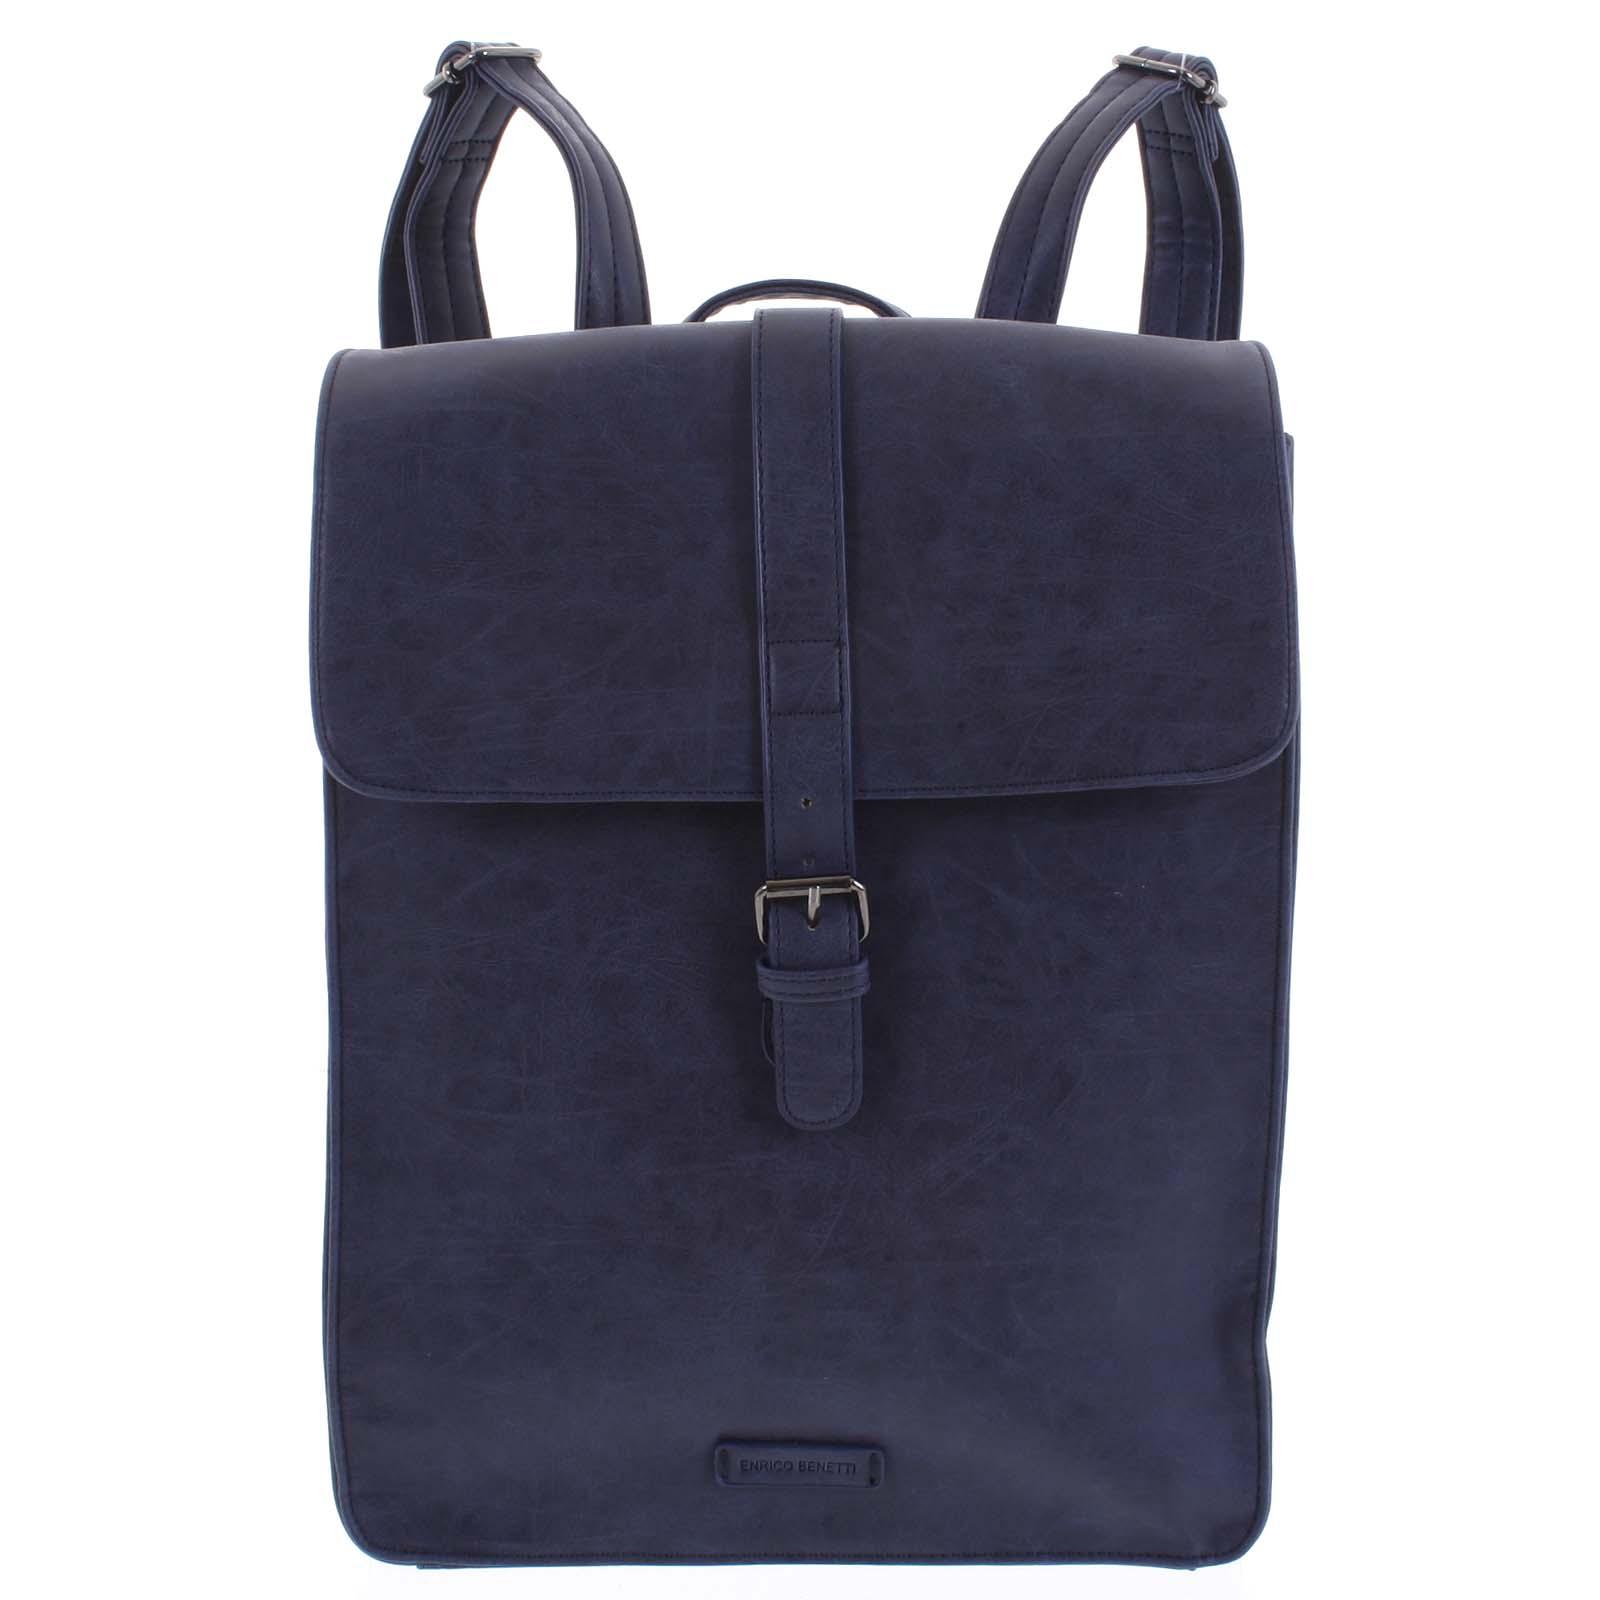 Stylový batoh tmavě modrý - Enrico Benetti Darlo tmavě modrá